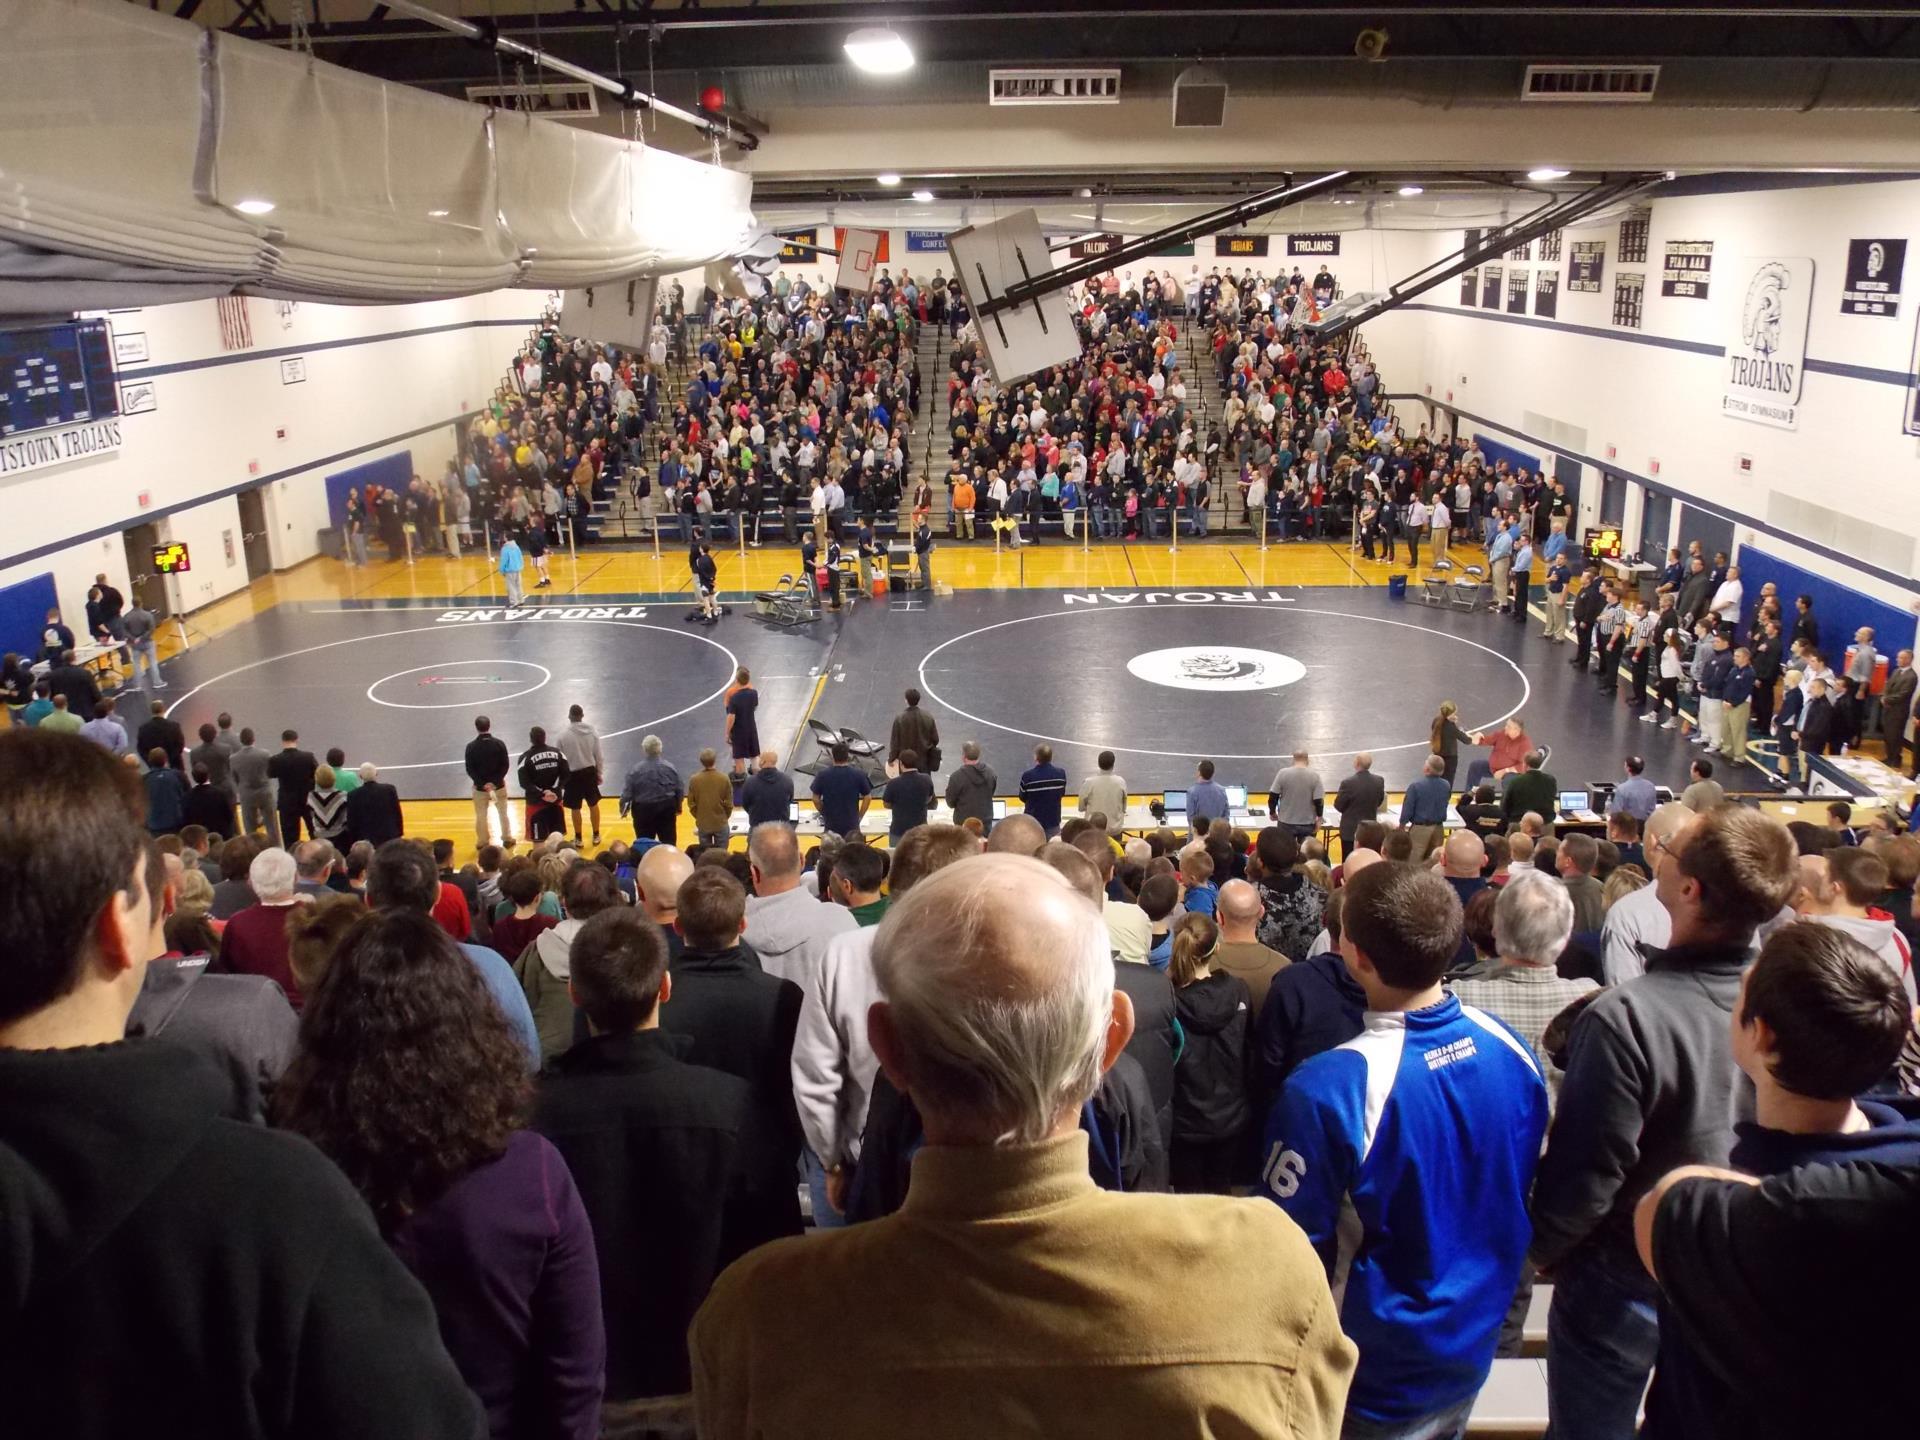 crowd at psd tournament